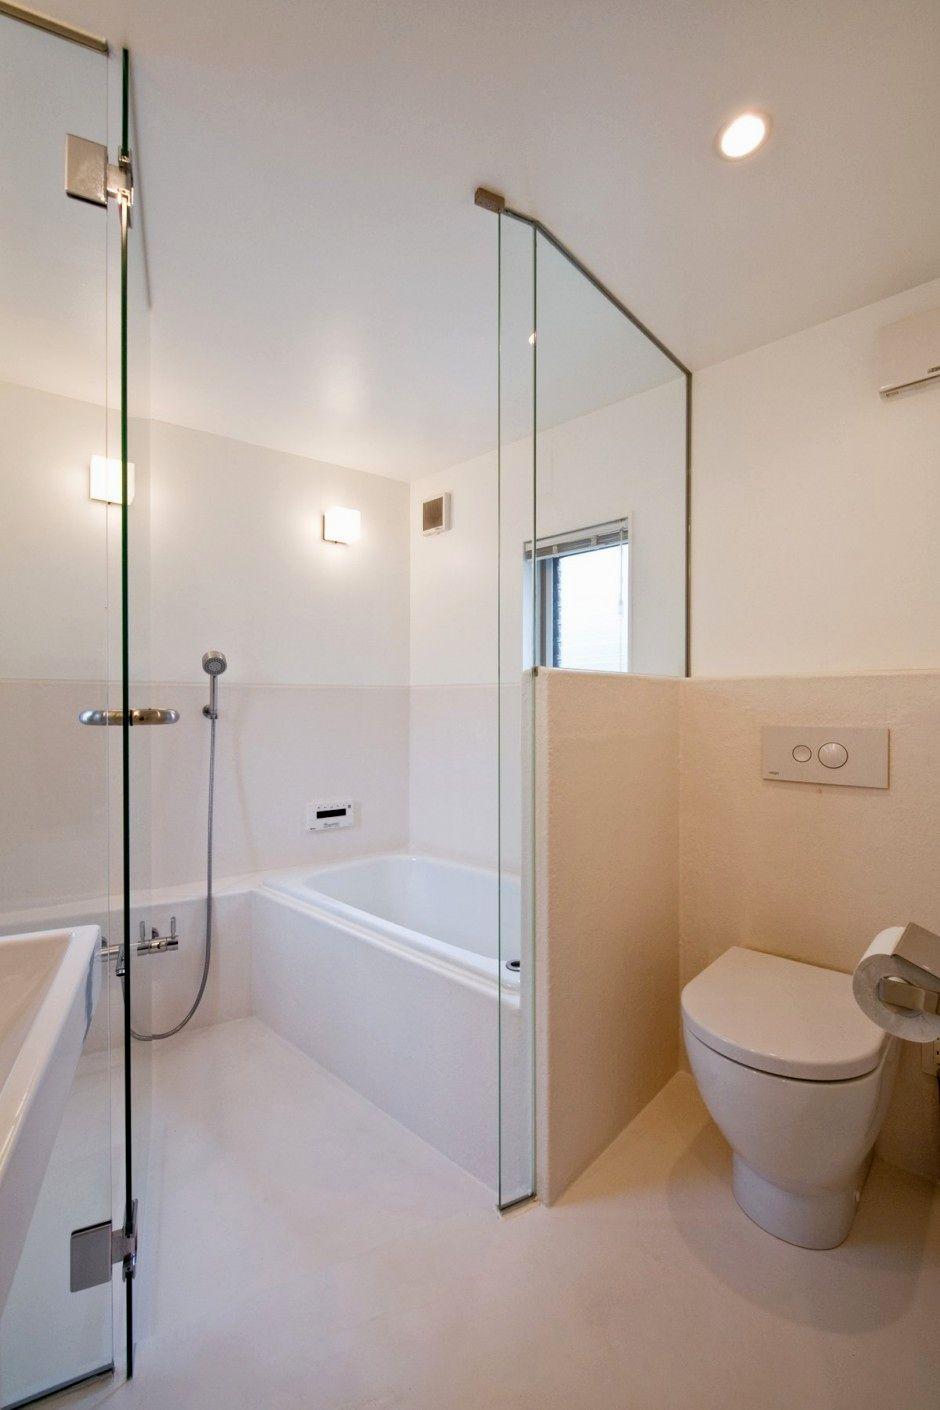 terrific tiny house bathroom picture-Amazing Tiny House Bathroom Ideas